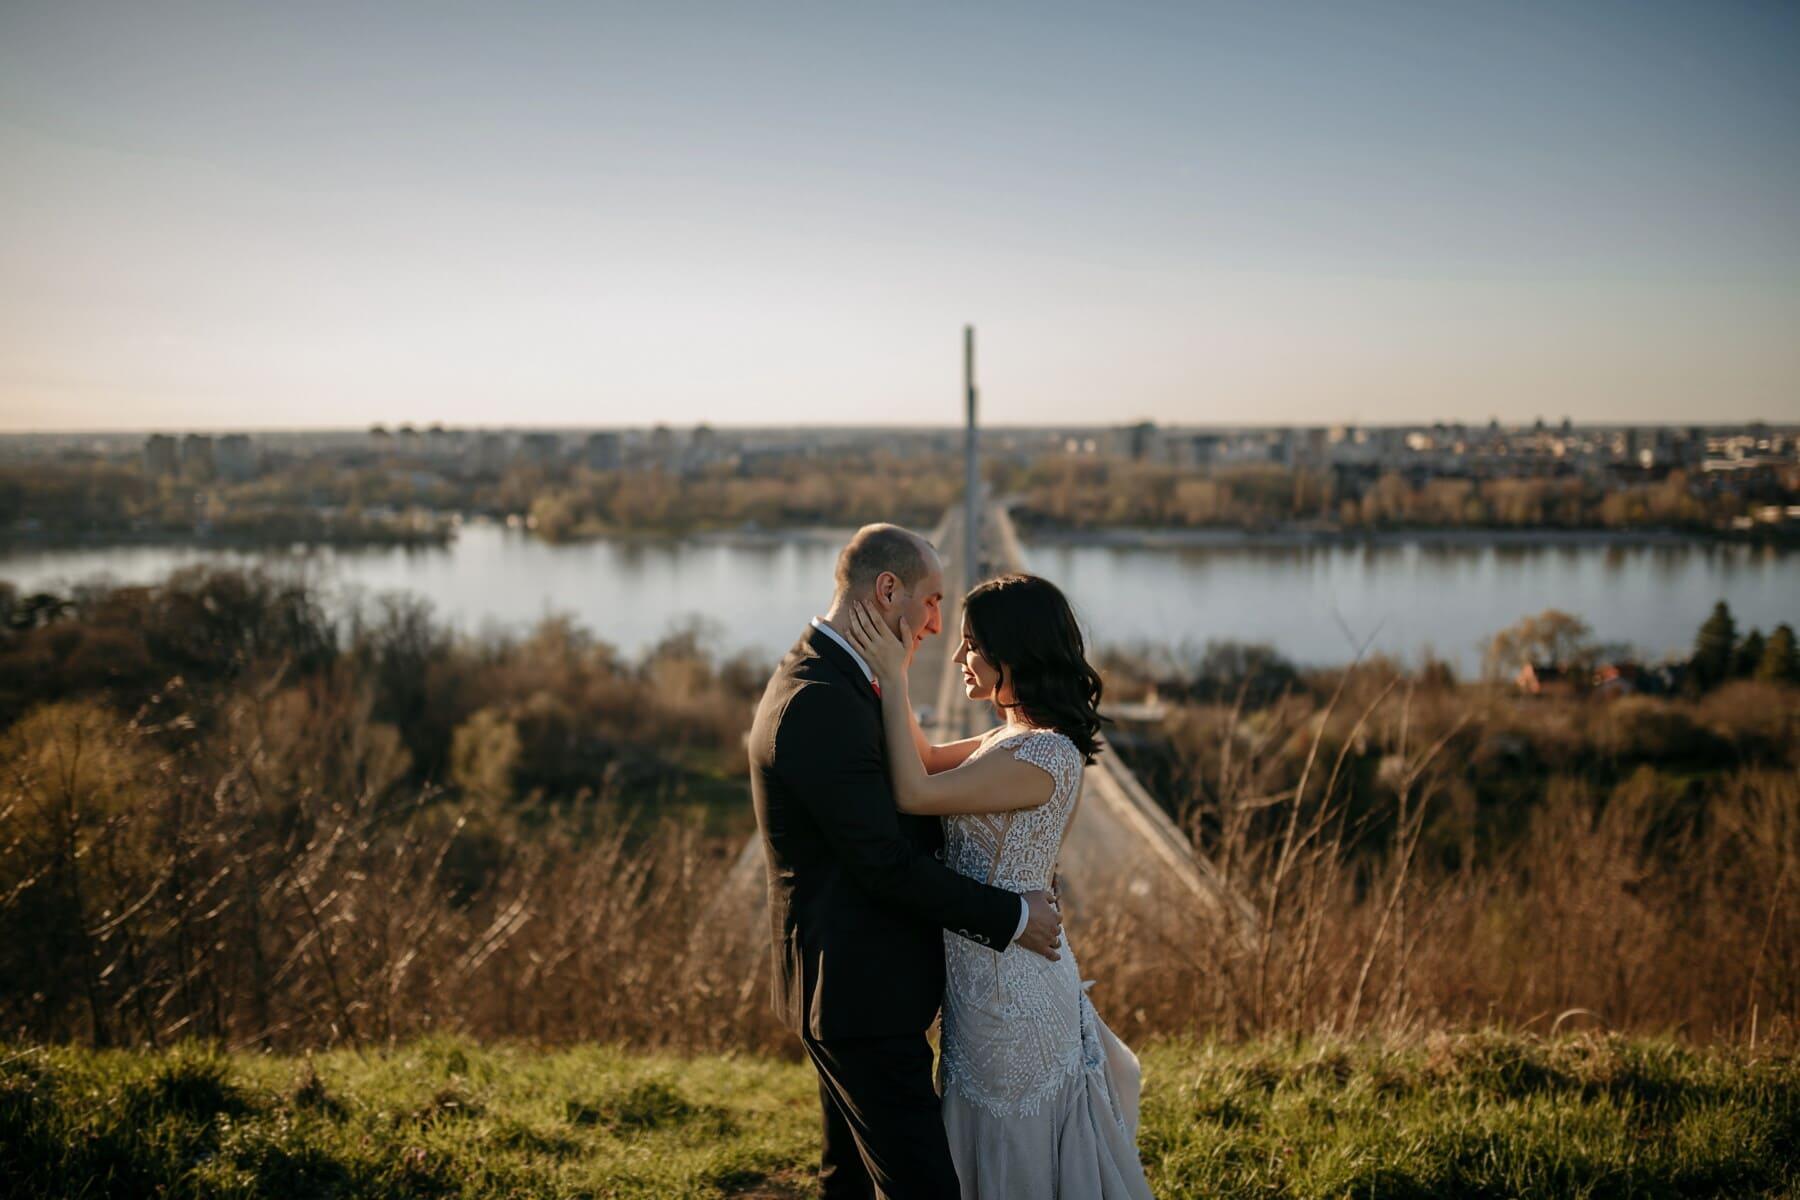 love date, love, hugging, boyfriend, girlfriend, river, outdoor, nature, girl, grass